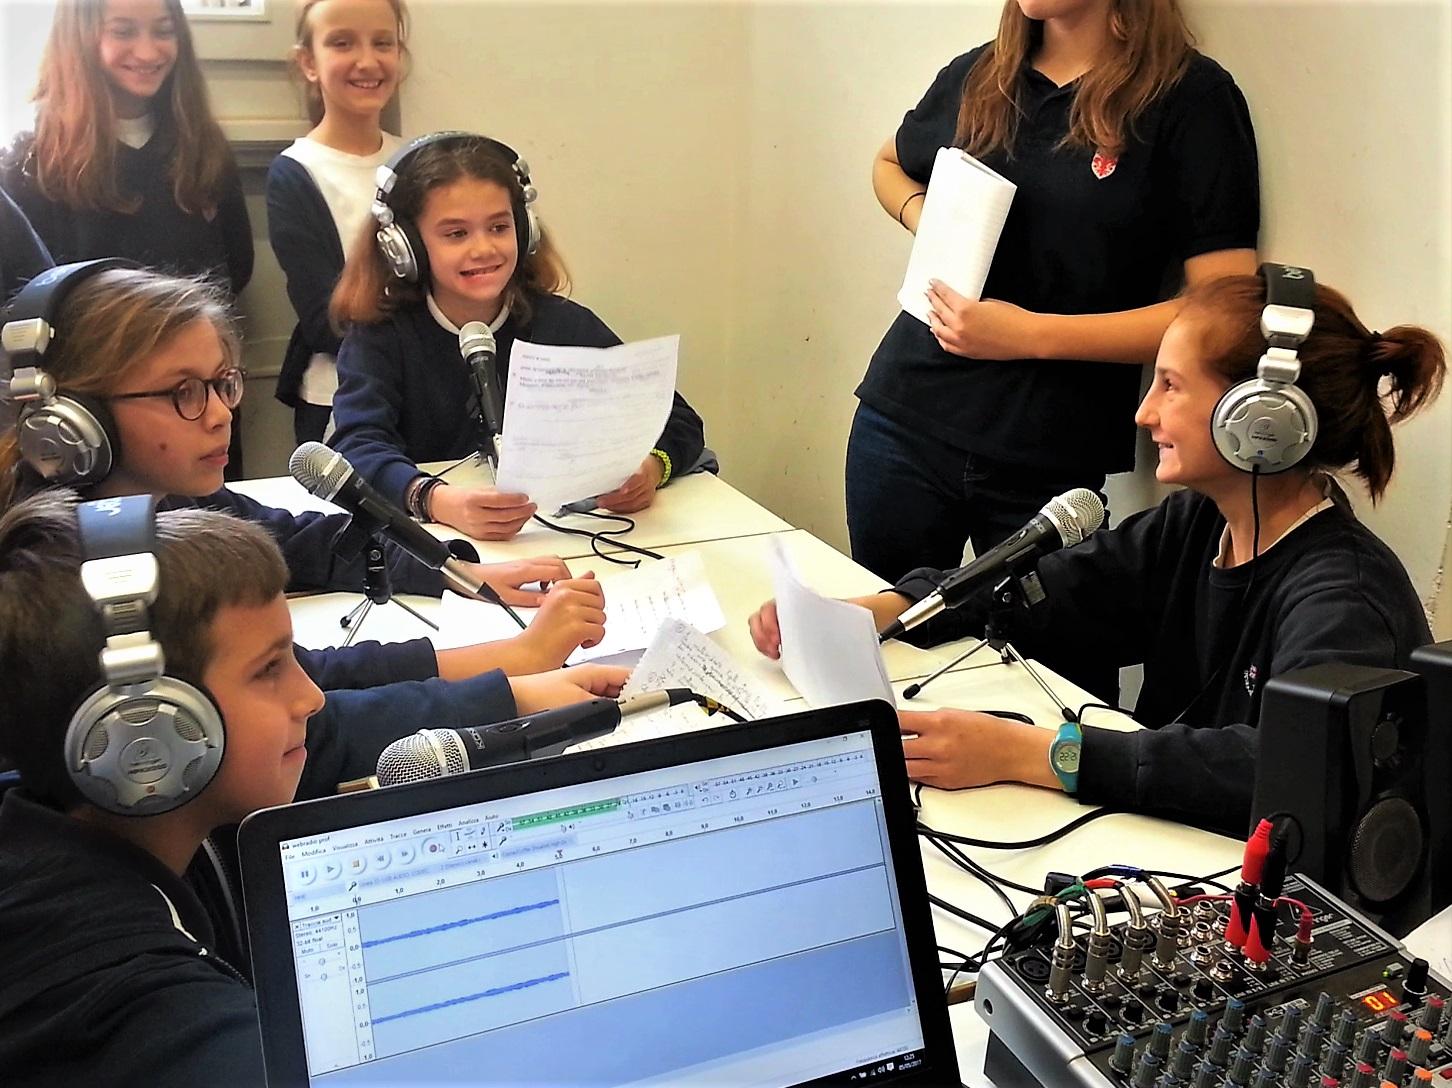 Club webradio en collège, à Florence